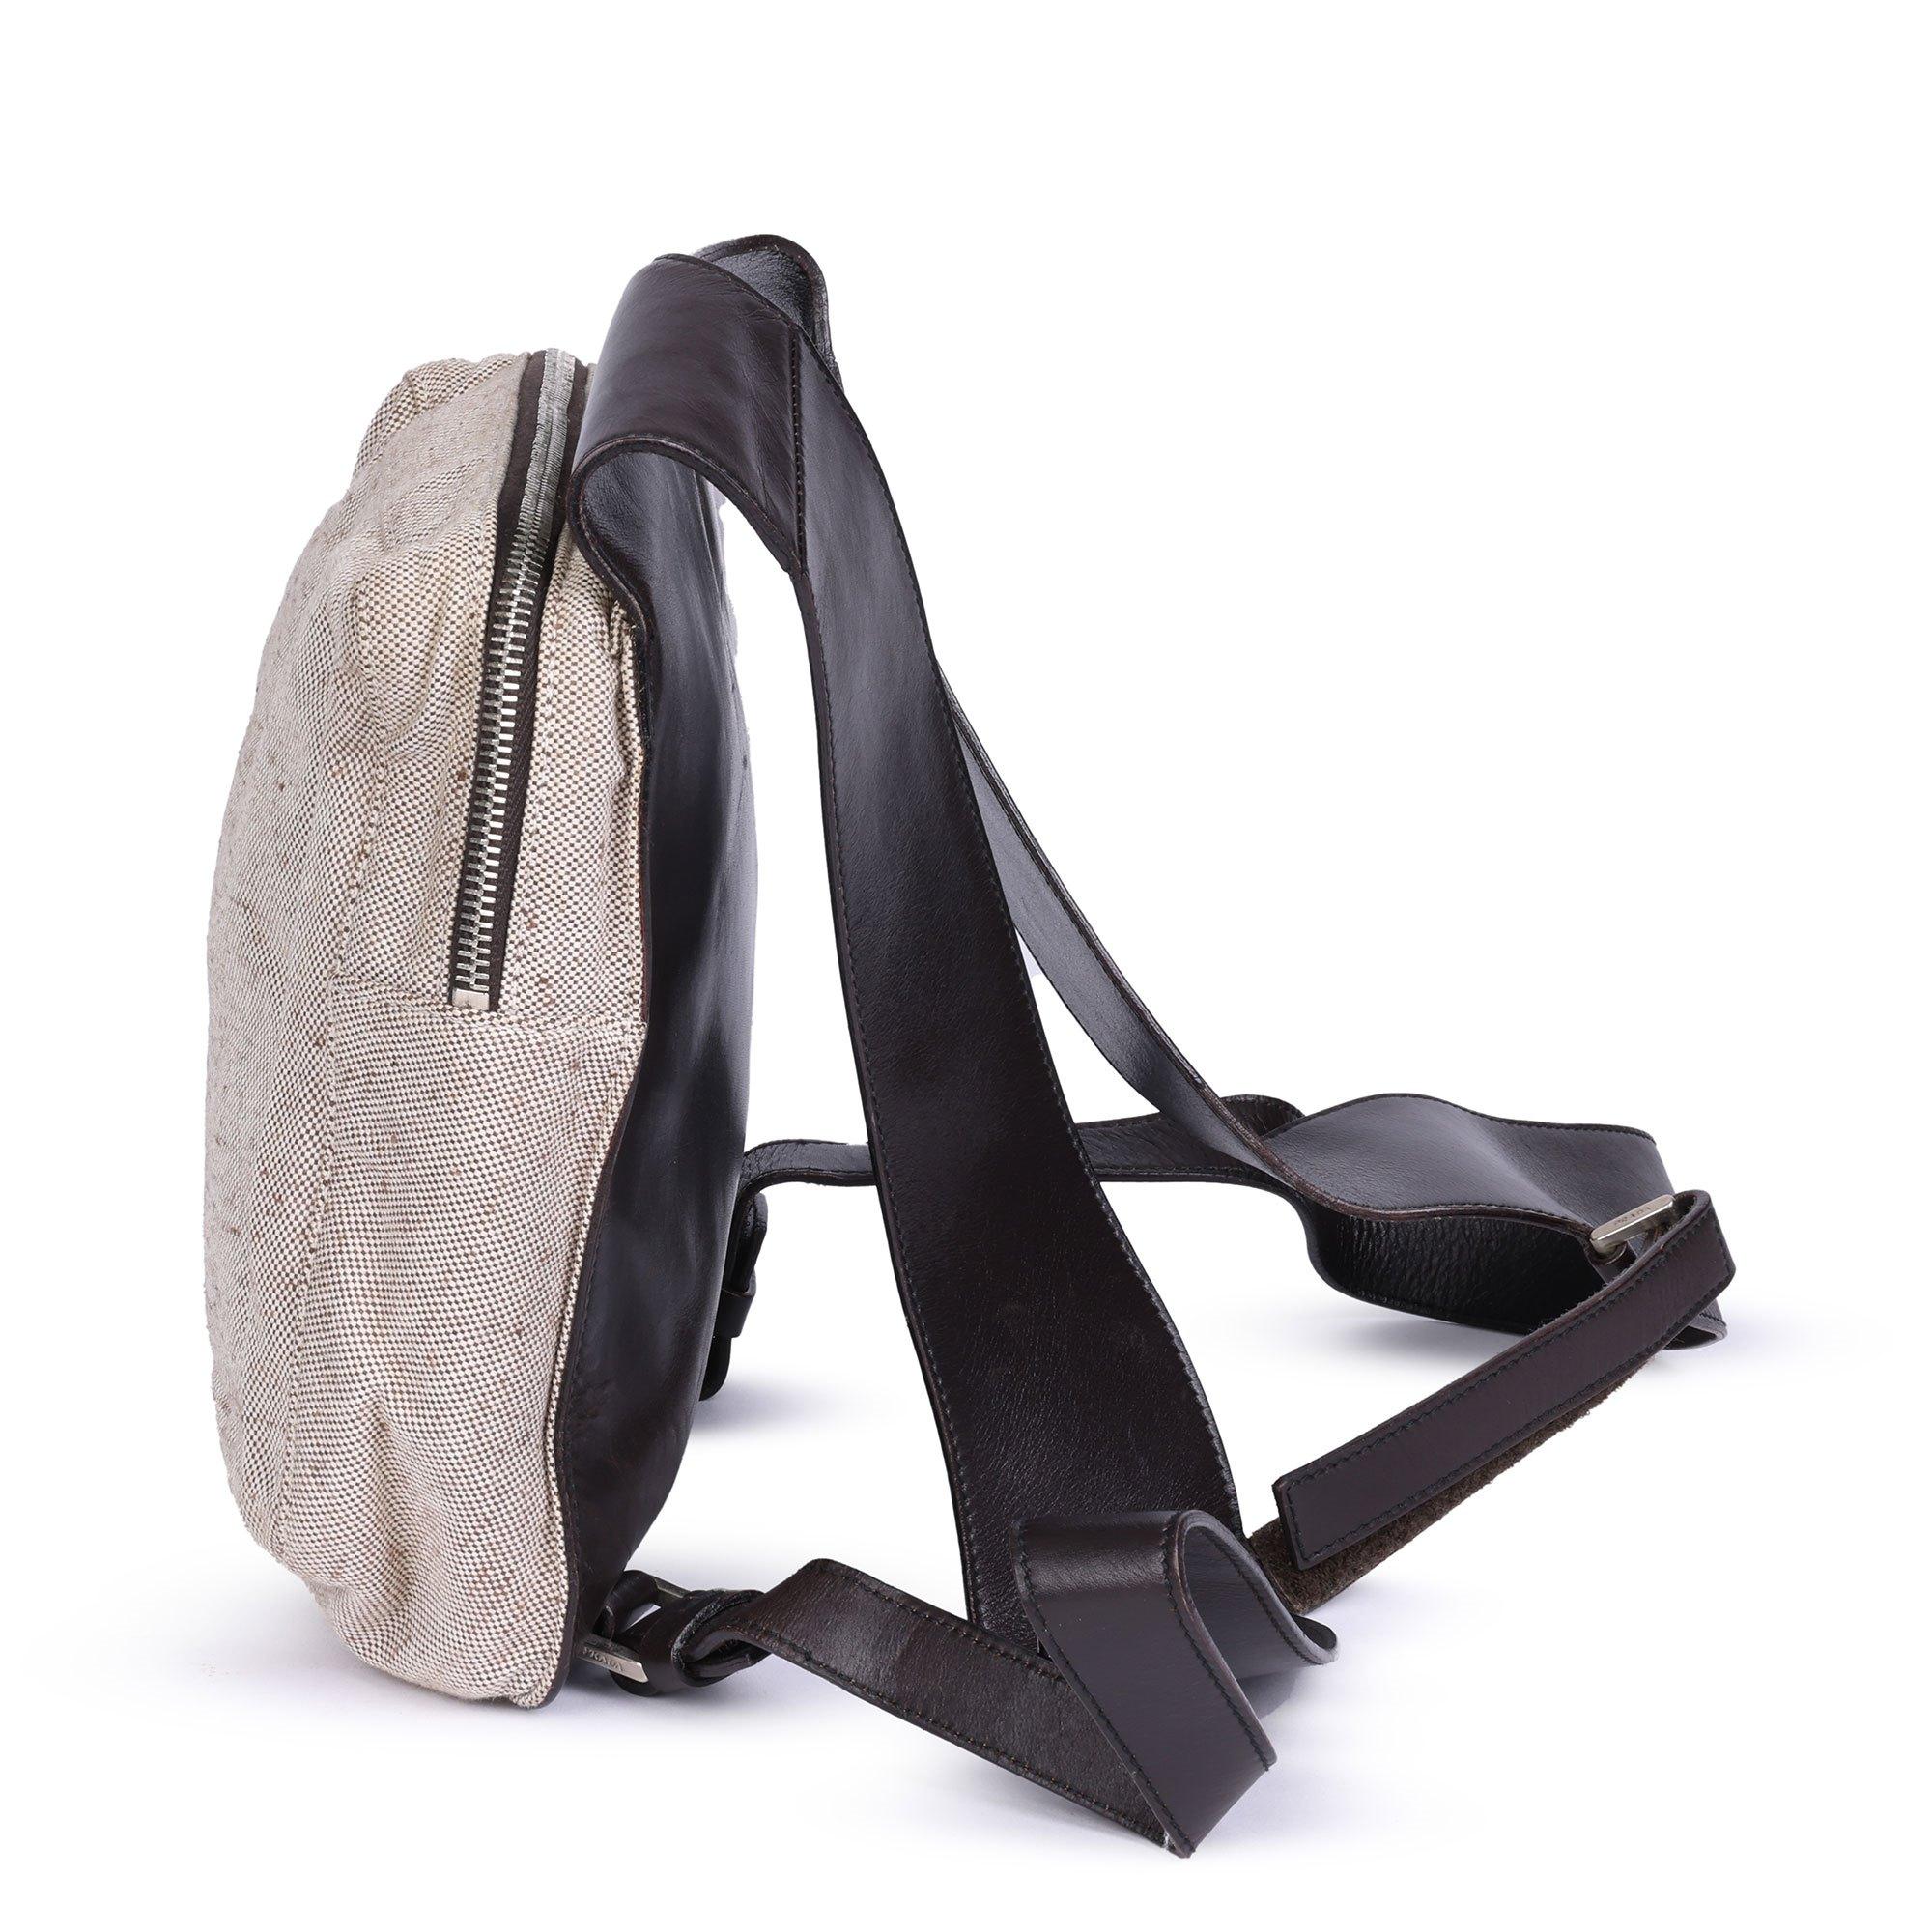 Prada Beige Canvas & Brown Leather Vintage Chest Rig Backpack